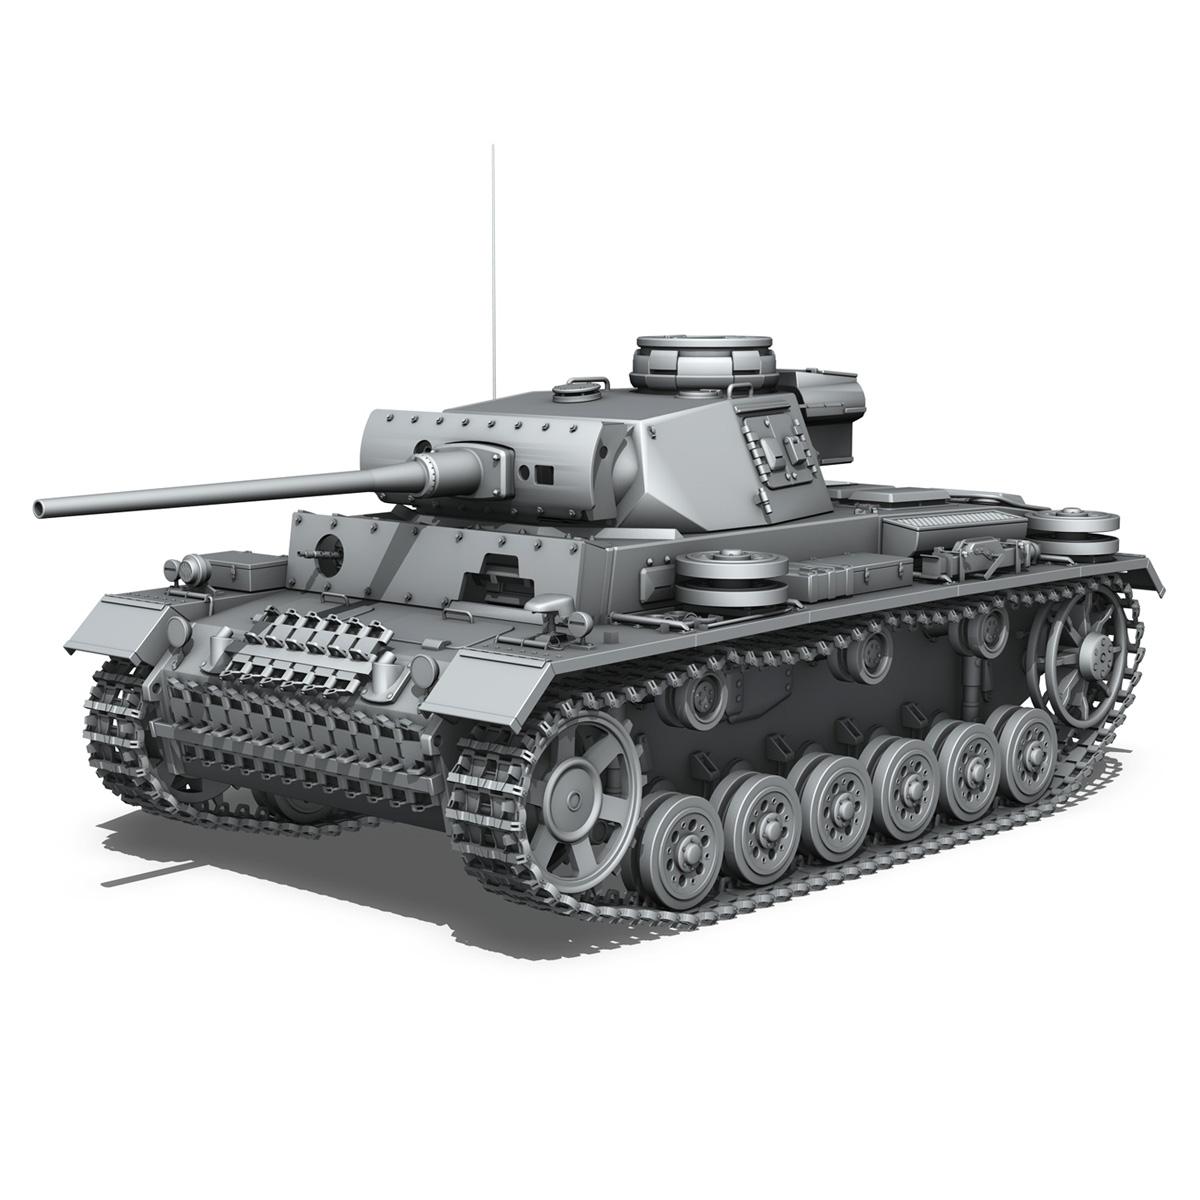 pzkpfw iii – panzerkampfwagen iii – ausf.l 3d model 3ds fbx c4d lwo obj 252155